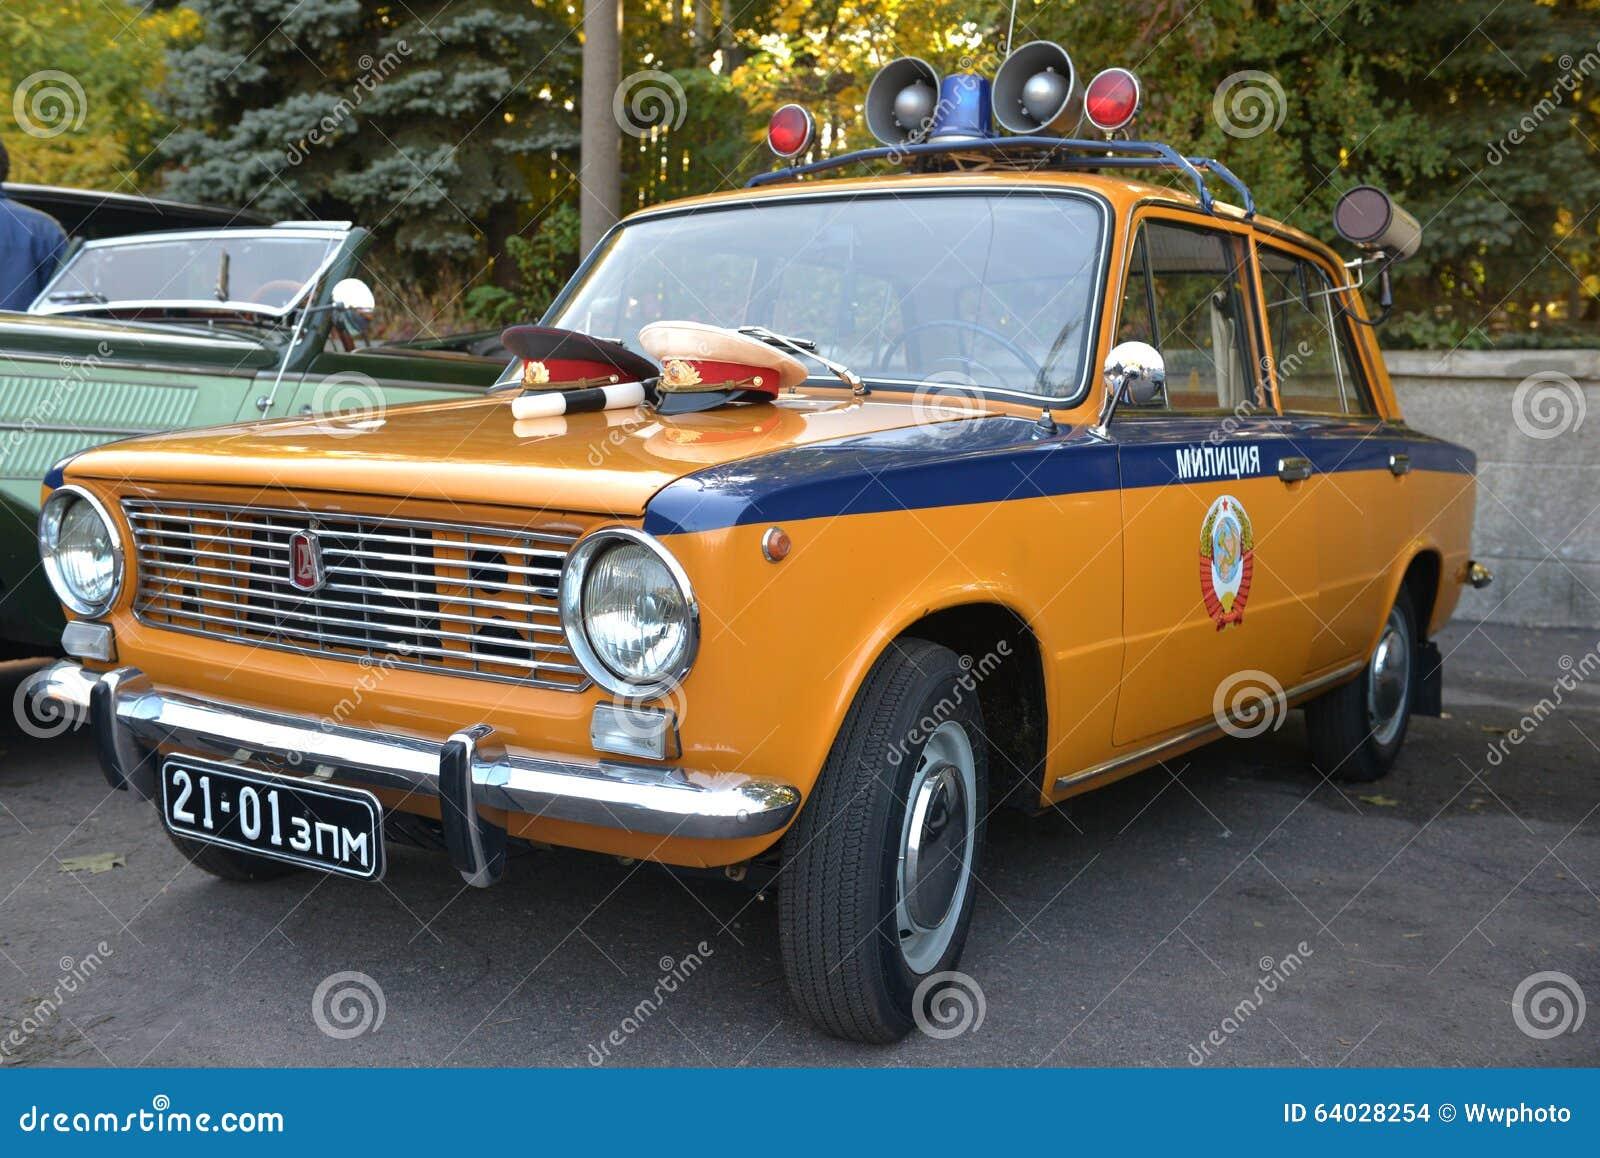 Soviet Union Police Car Editorial Stock Image Image Of